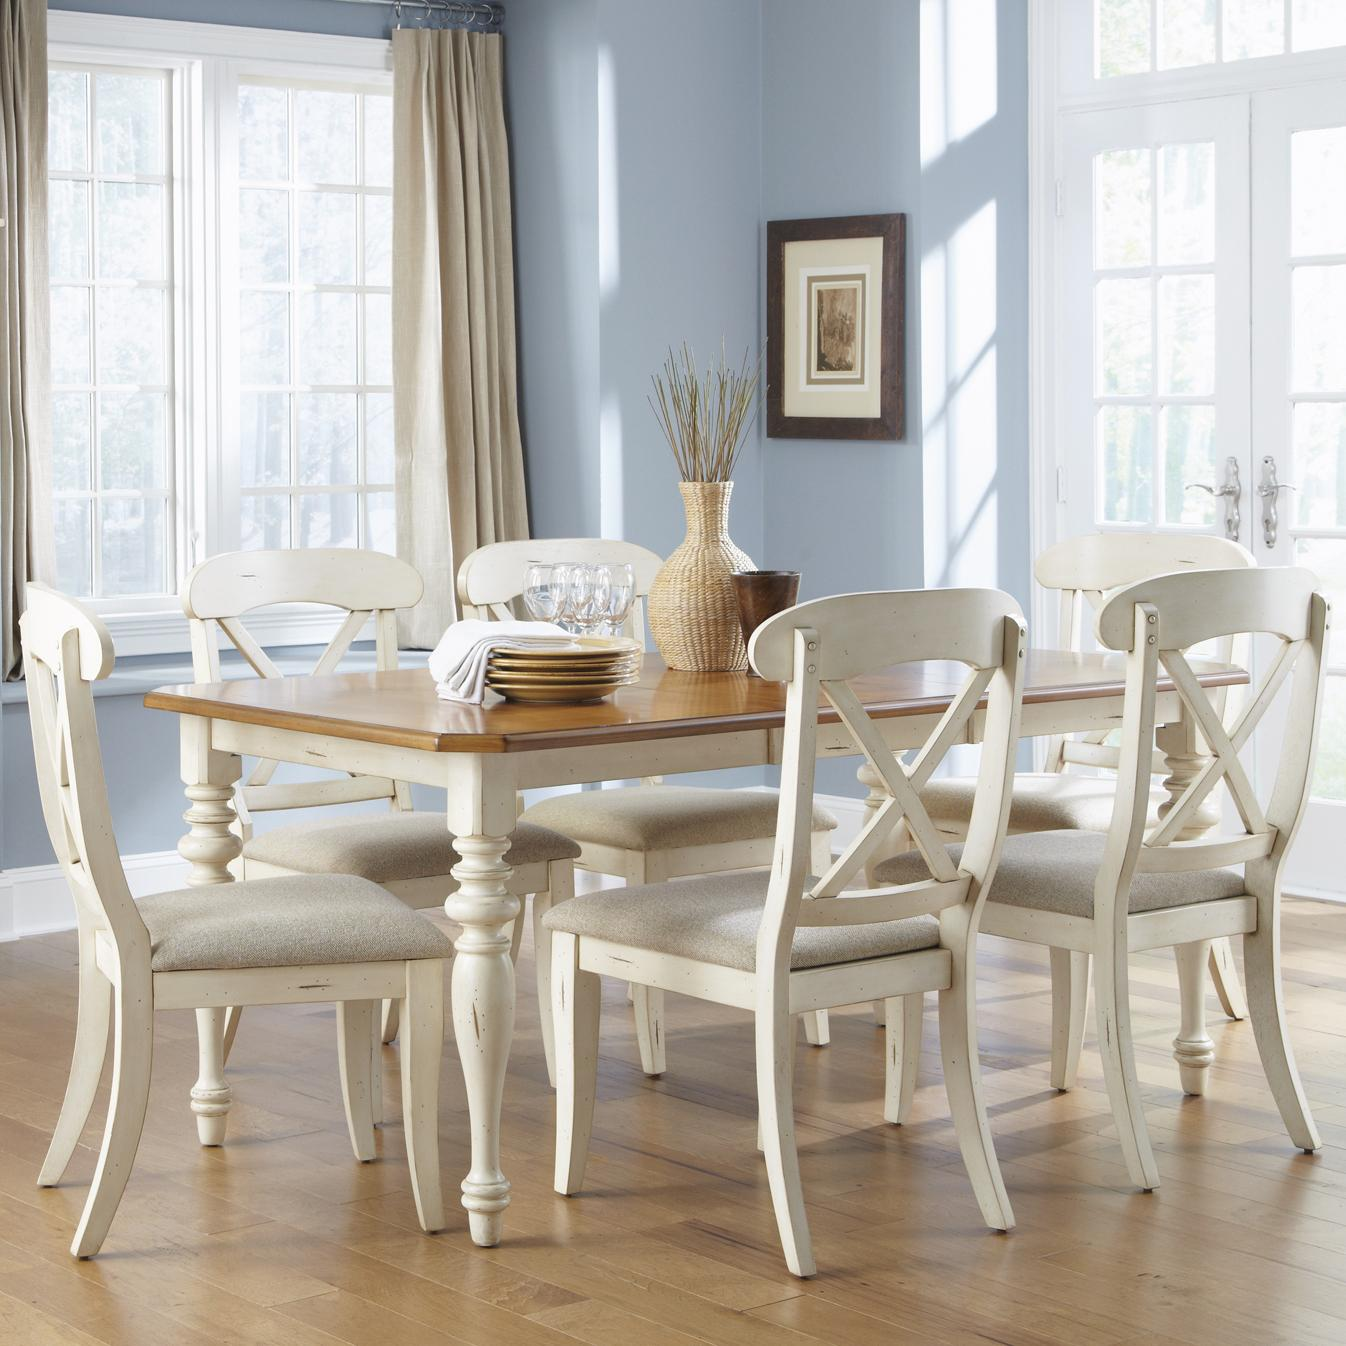 Ocean Isle  7-Piece Dining Set  by Liberty Furniture at Lapeer Furniture & Mattress Center